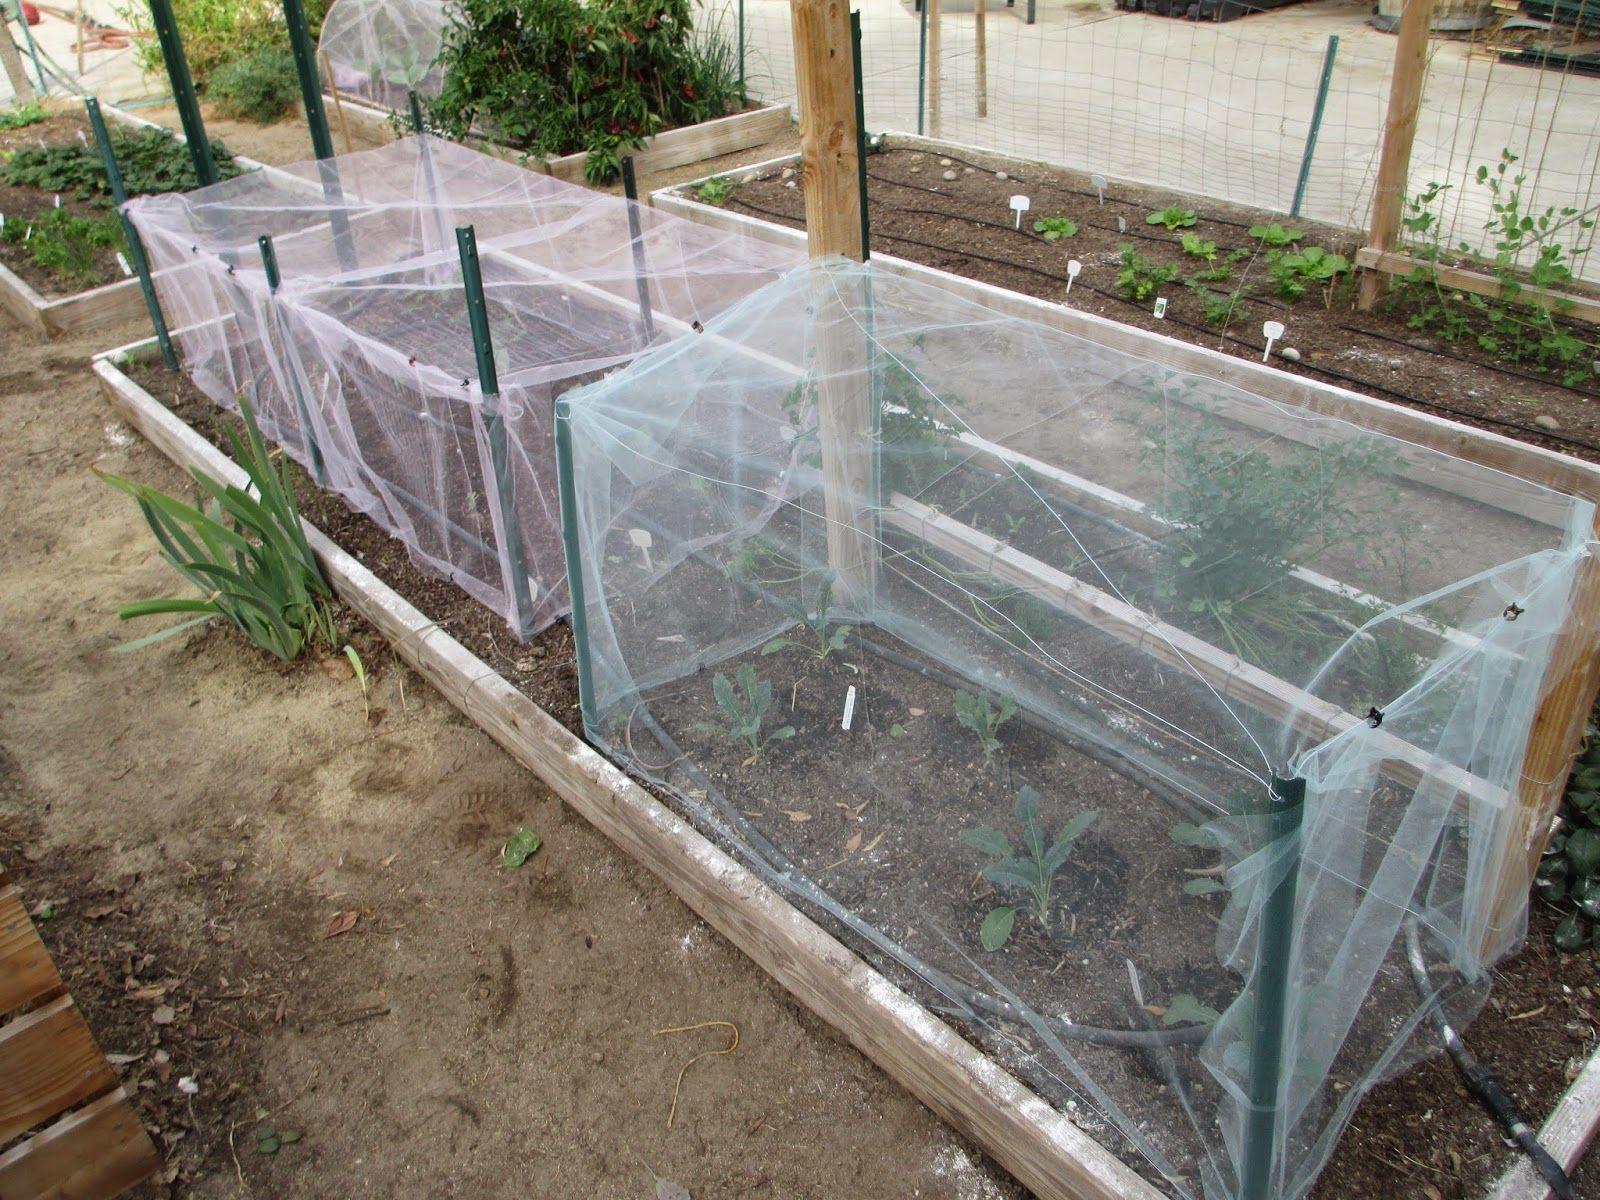 Making Bigger Cabbage Row Covers Veggie Garden Broccoli Plant